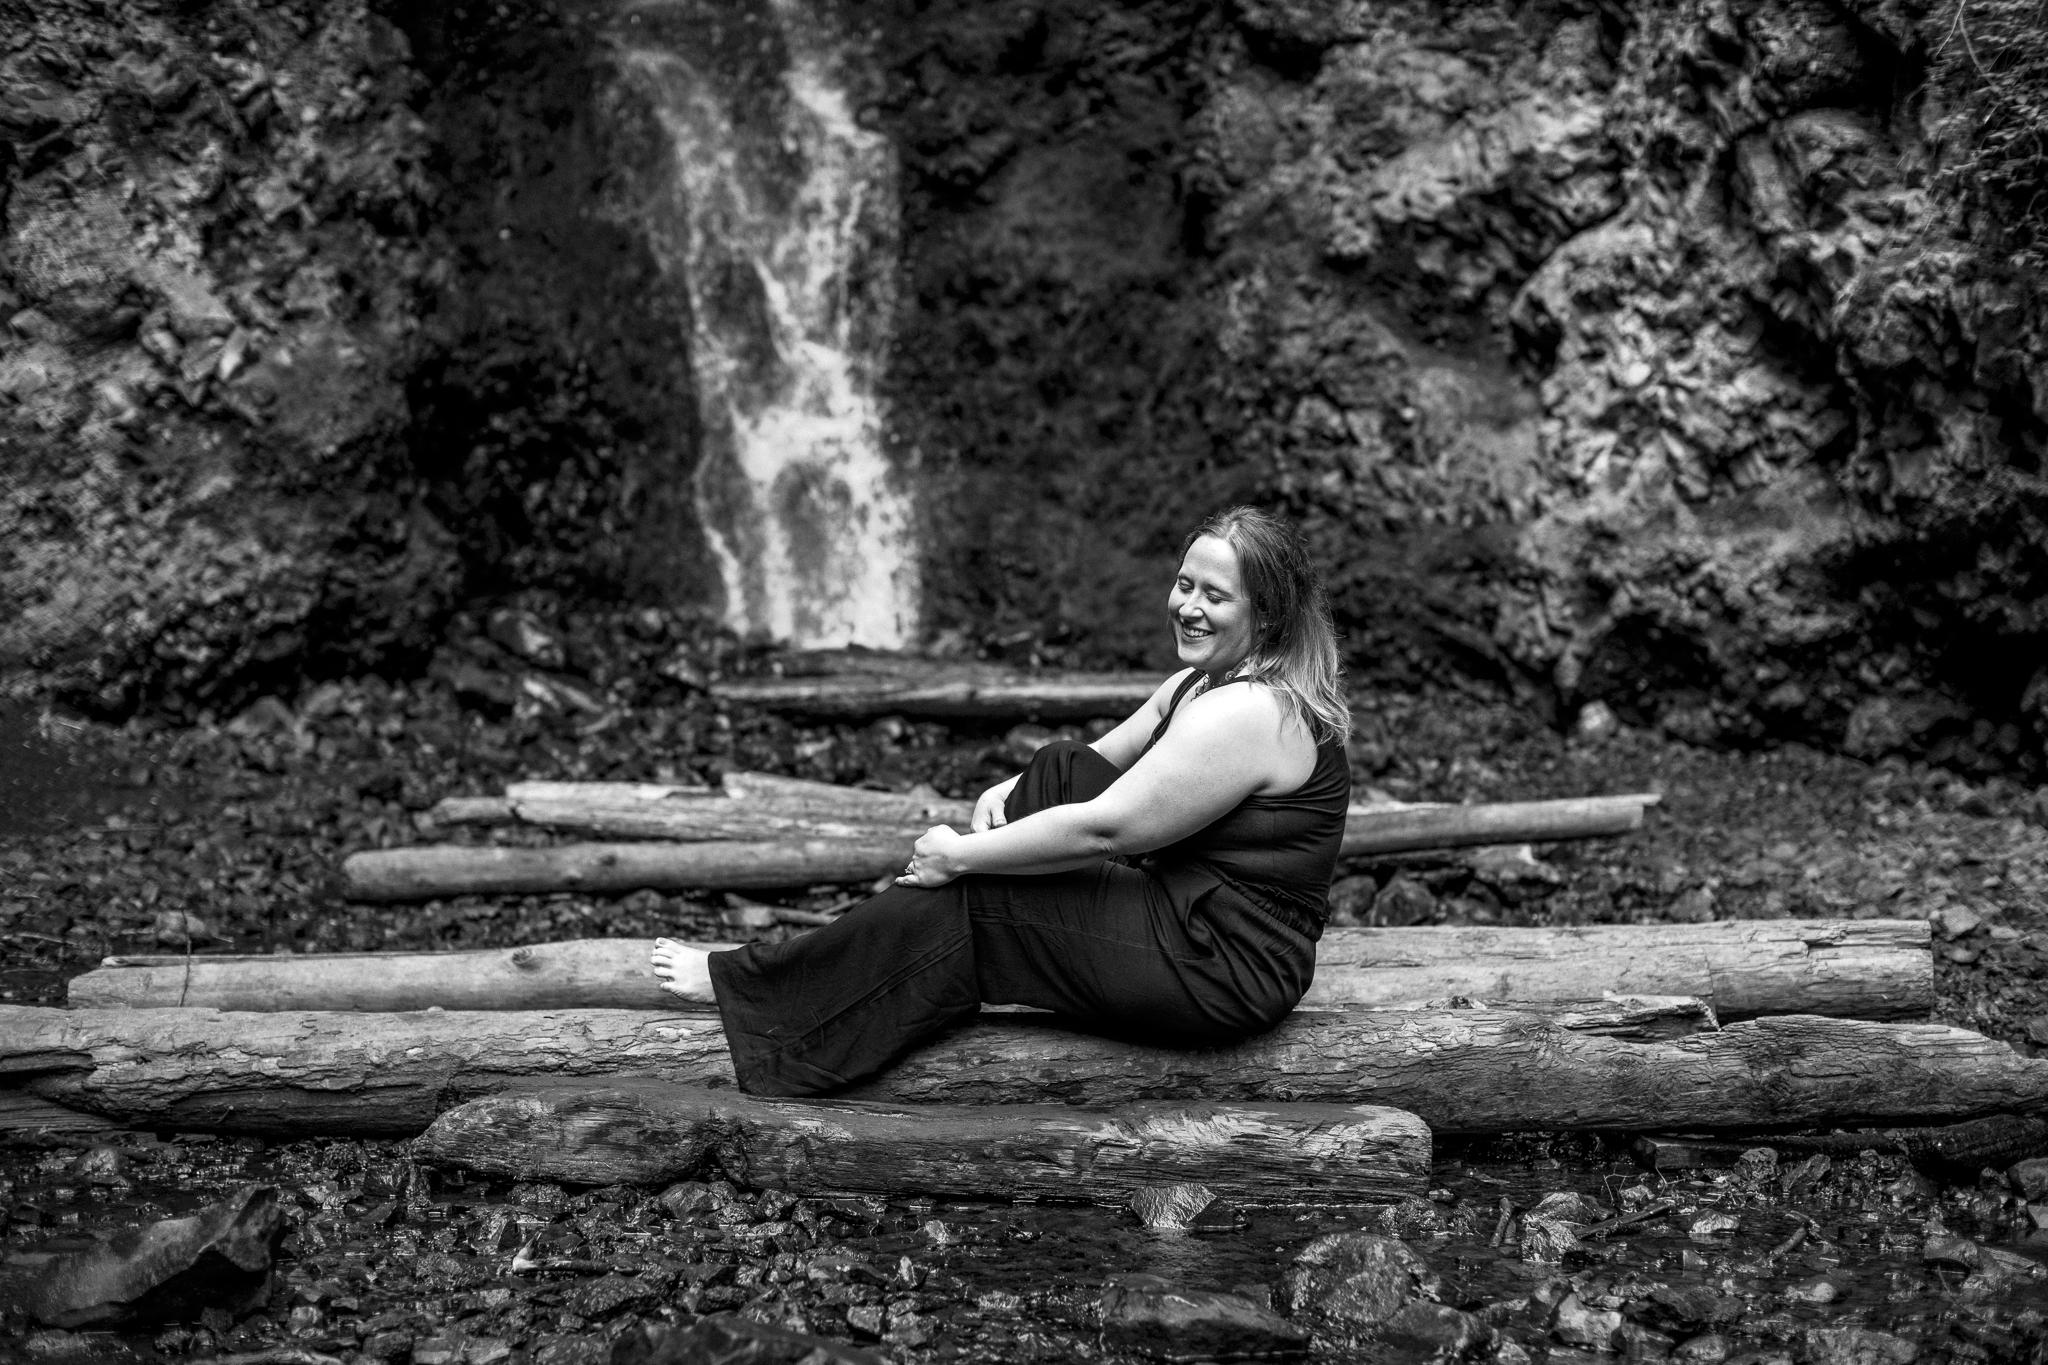 Spokane-Womens-Empowerment2019-06-06 at 3.46.21 PM 4.jpg